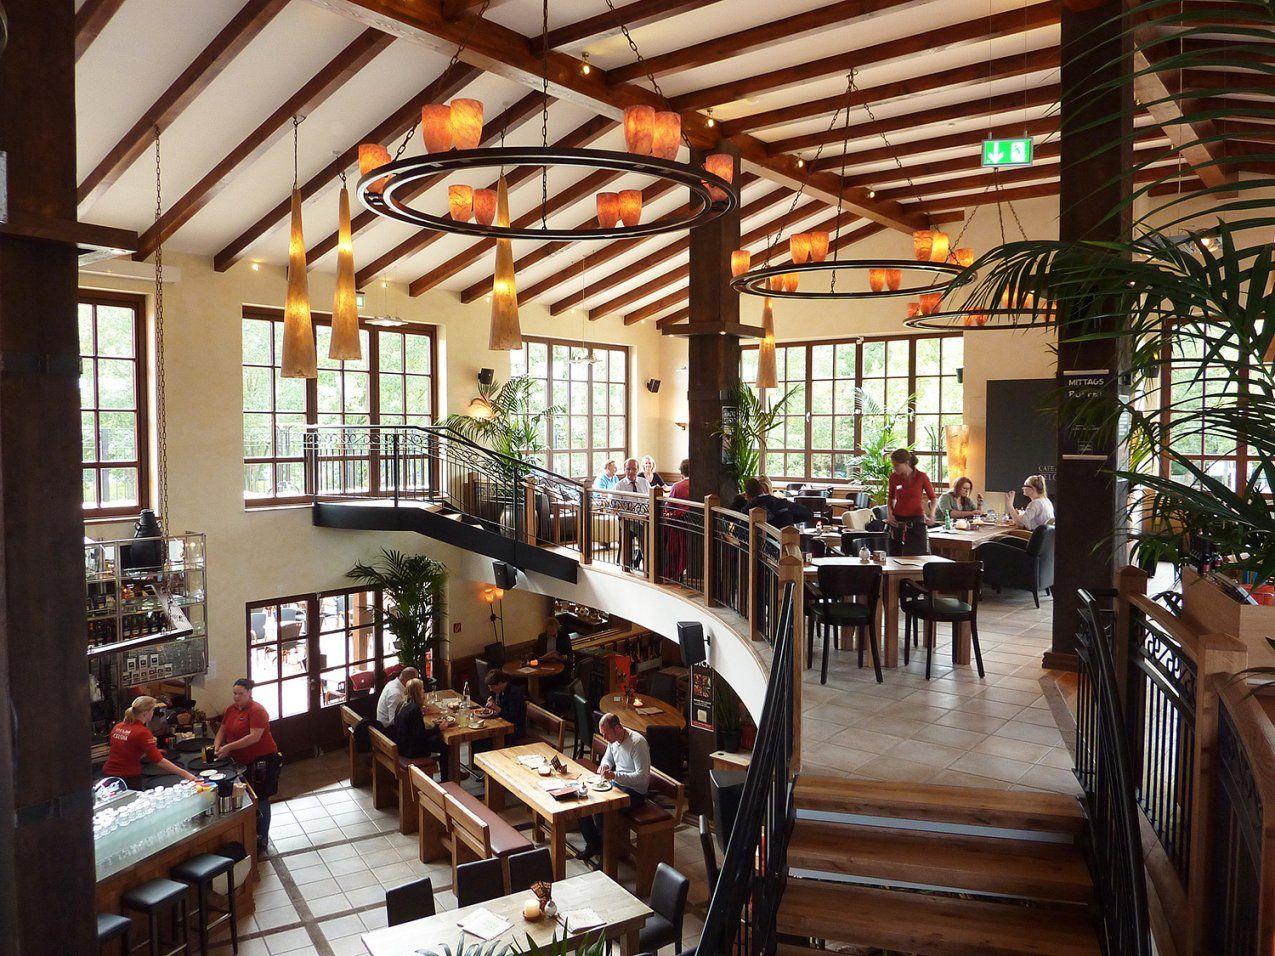 Finca & Bar Celona Bielefeld  Cafe & Bar Celona von Finca & Bar Celona Bielefeld Photo